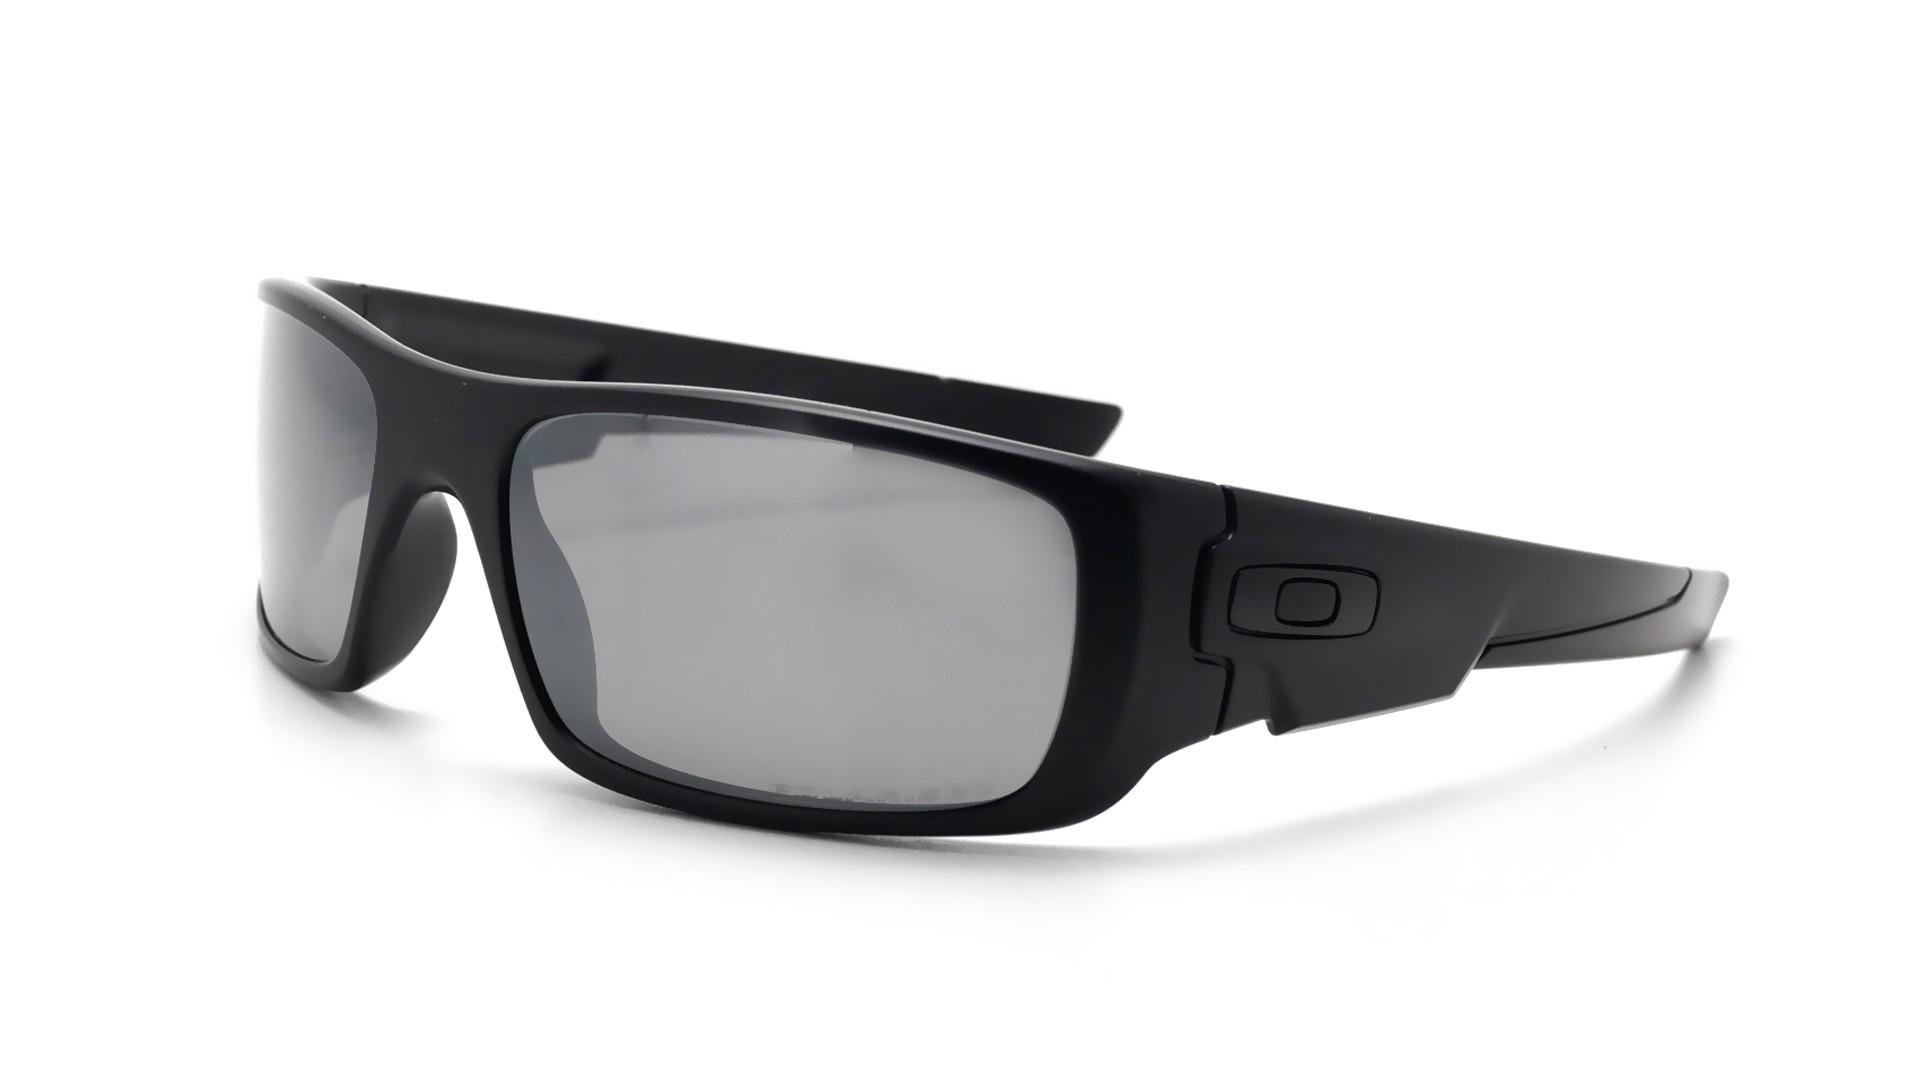 7d9b20b5a4 Sunglasses Oakley Crankshaft Black Mat OO9239 06 60-19 Medium Polarized